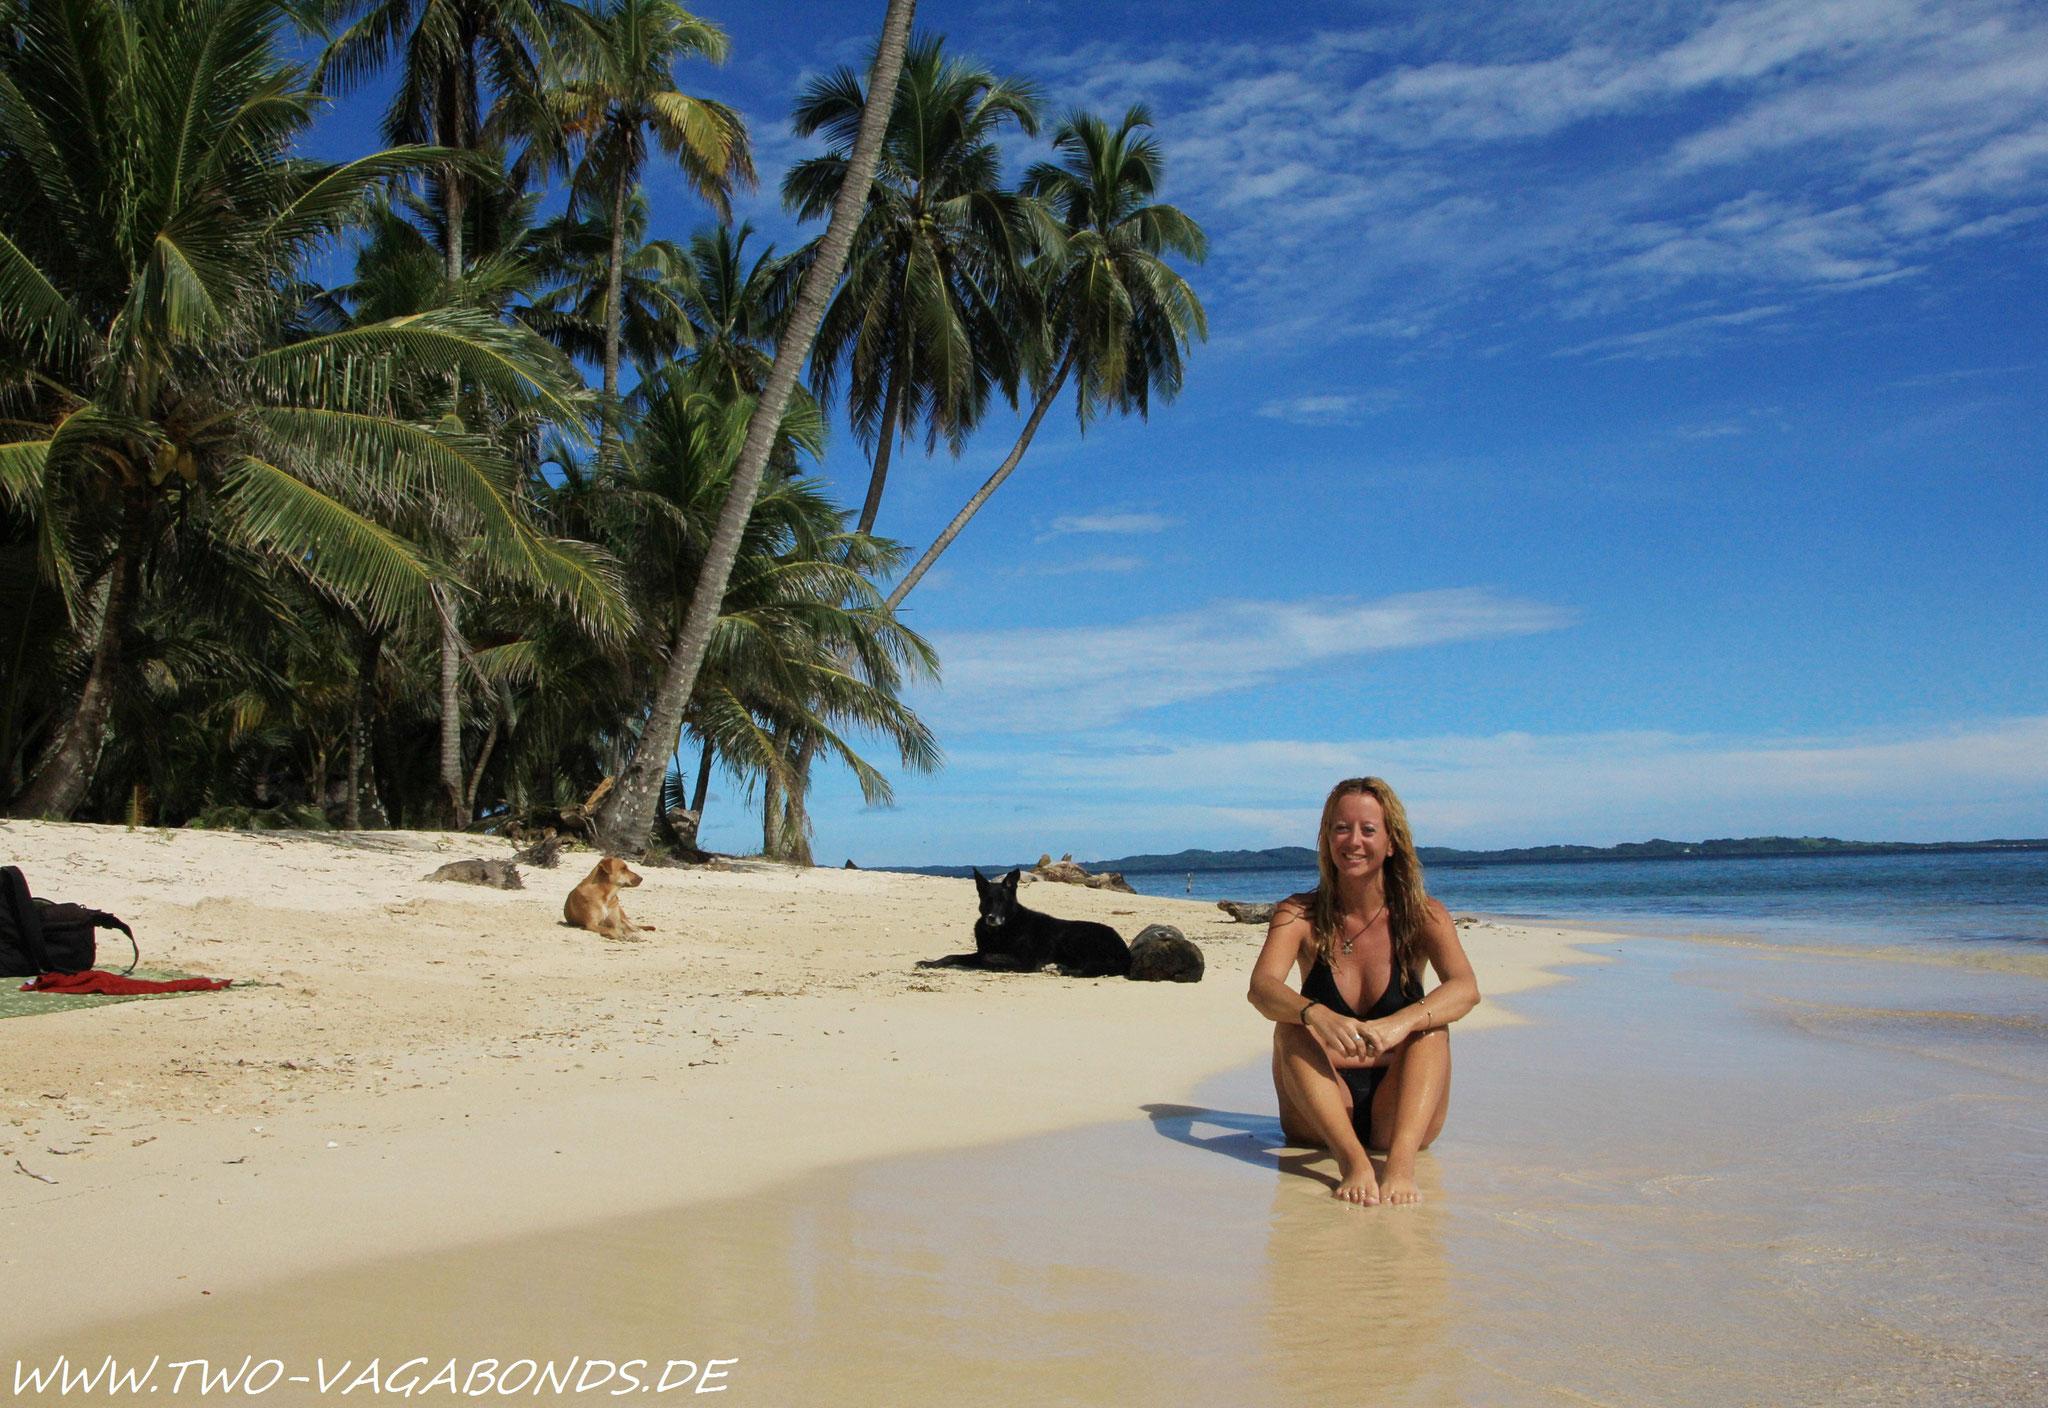 PANAMA 2013 - SAN BLAS ISLANDS